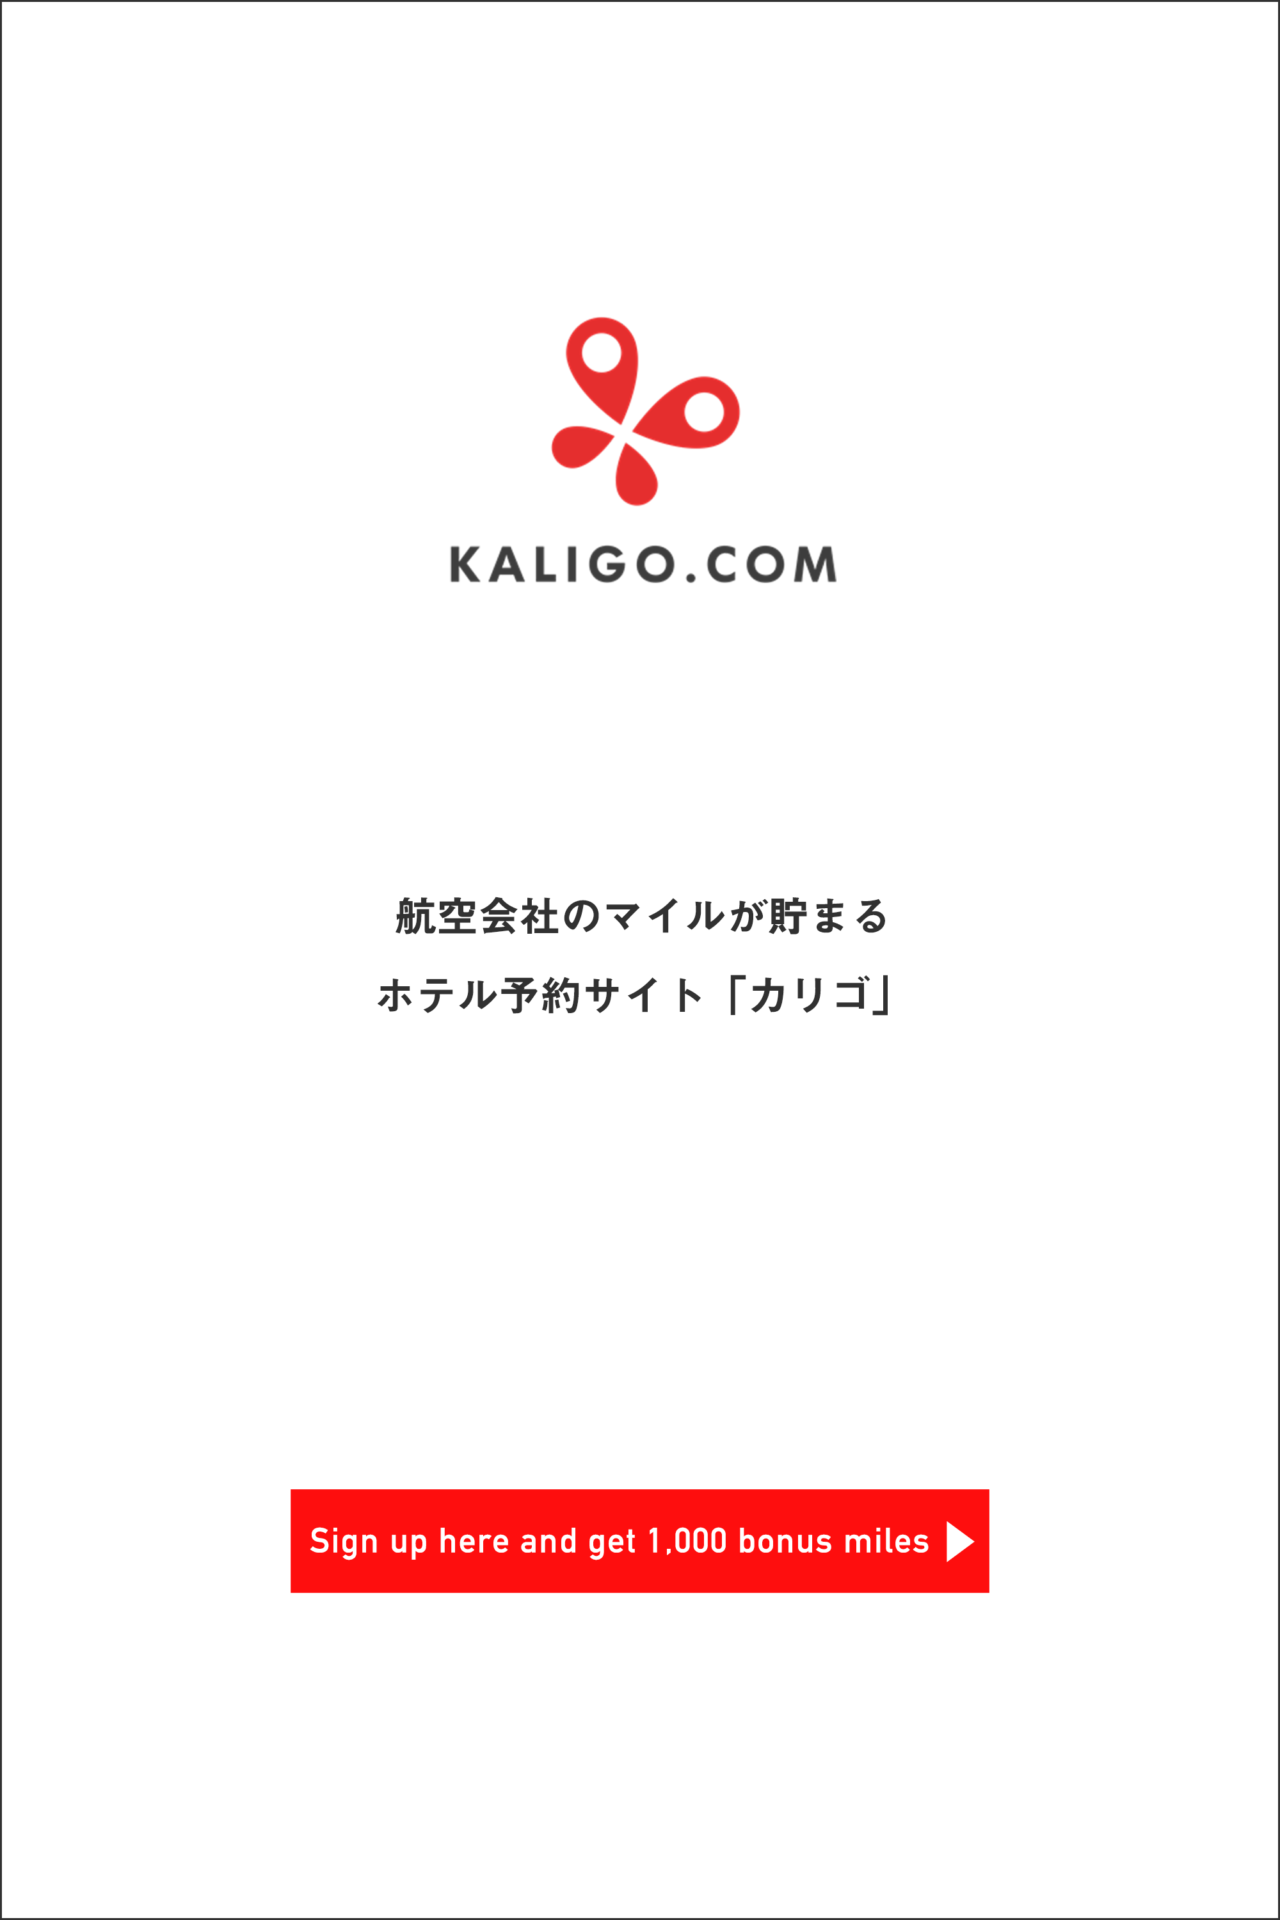 Kaligo(カリゴ)は航空会社のマイルが貯まるホテル予約サイト